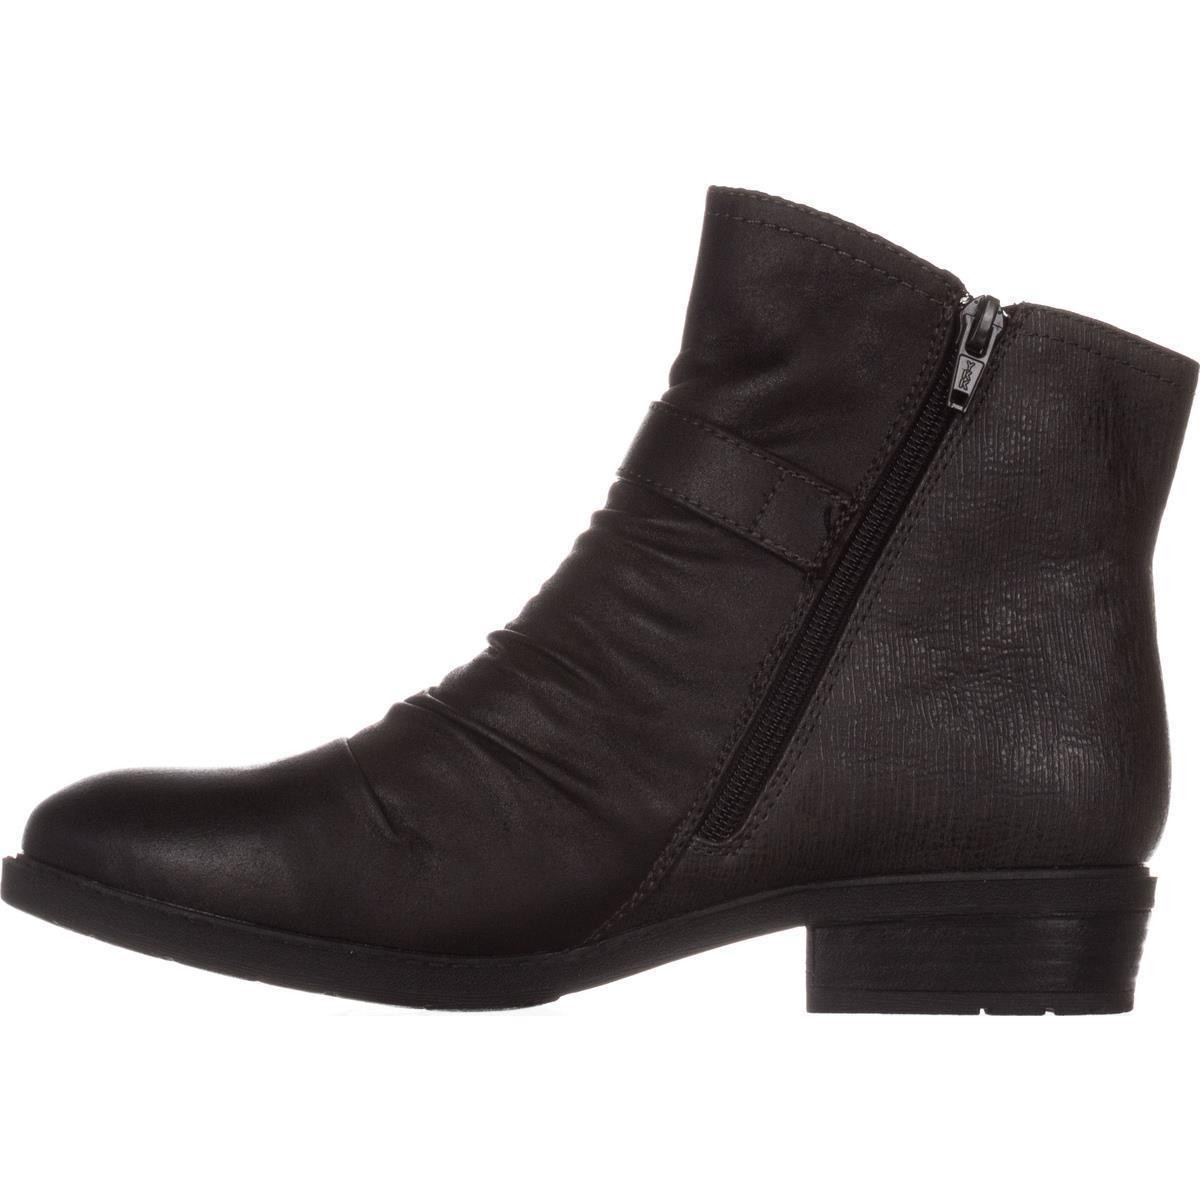 Bare Traps mujer Ysidora Ysidora Ysidora Almond Toe Ankle Fashion botas  bajo precio